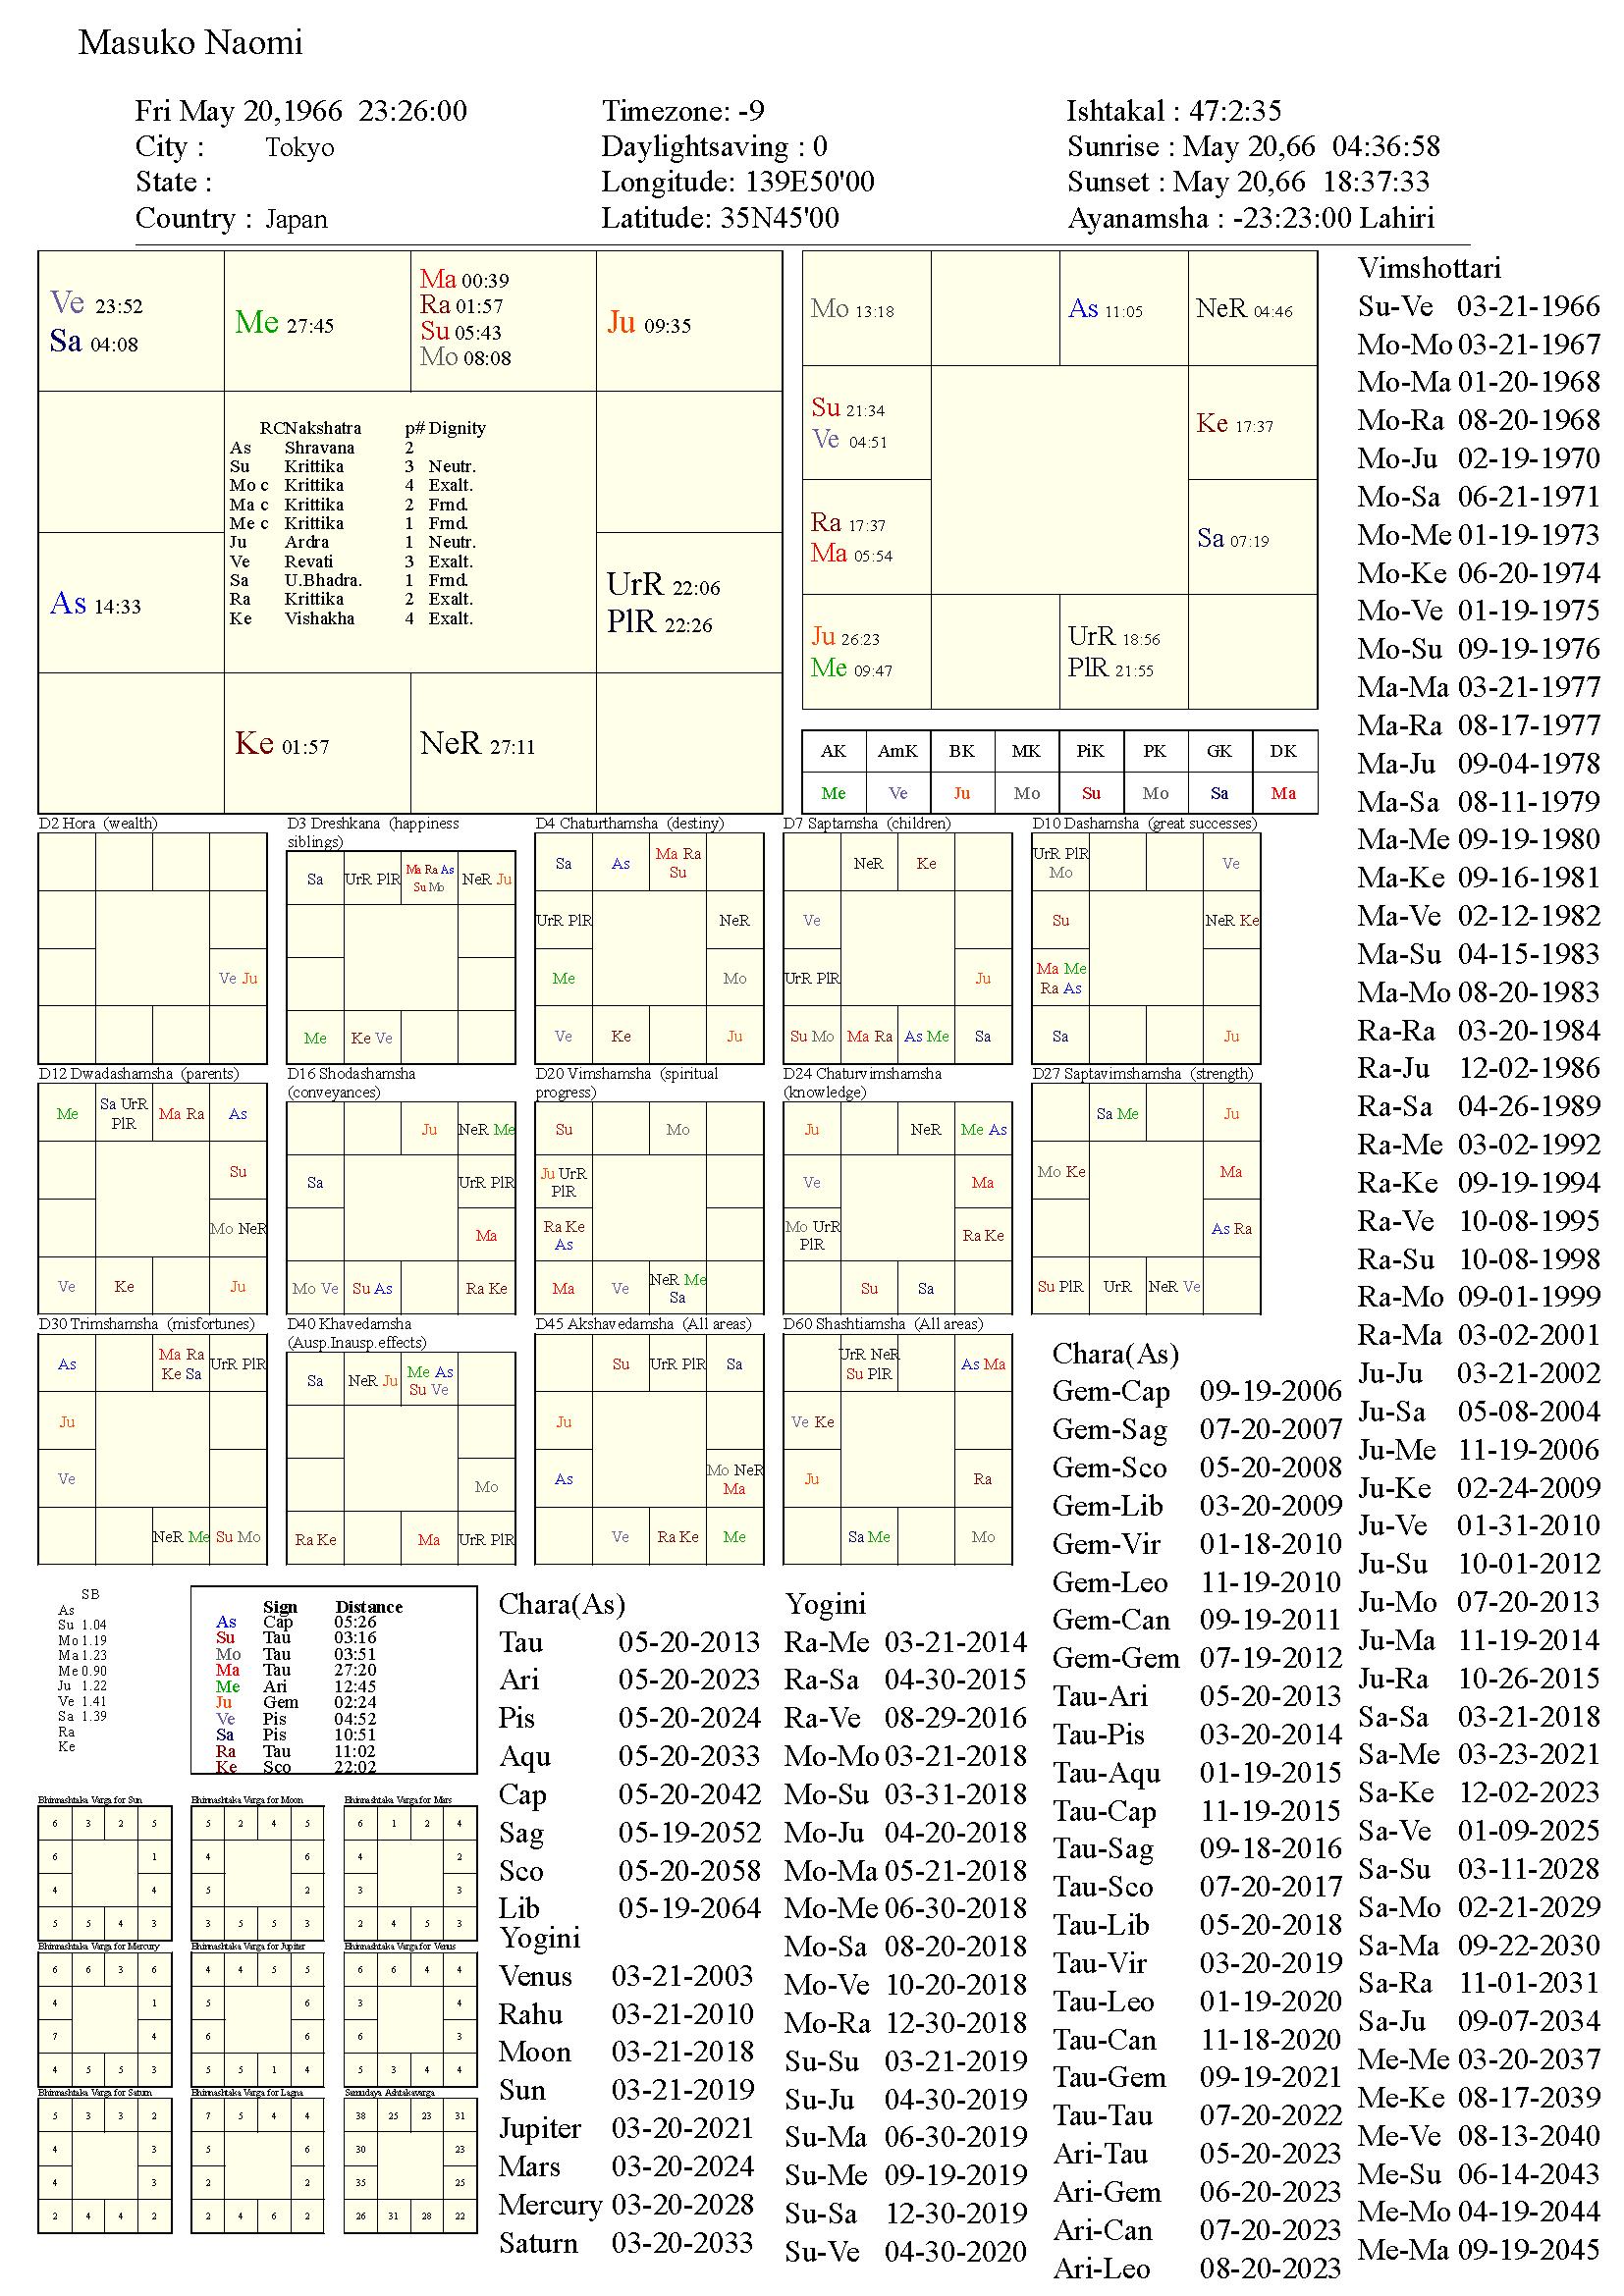 masukonaomi_chart